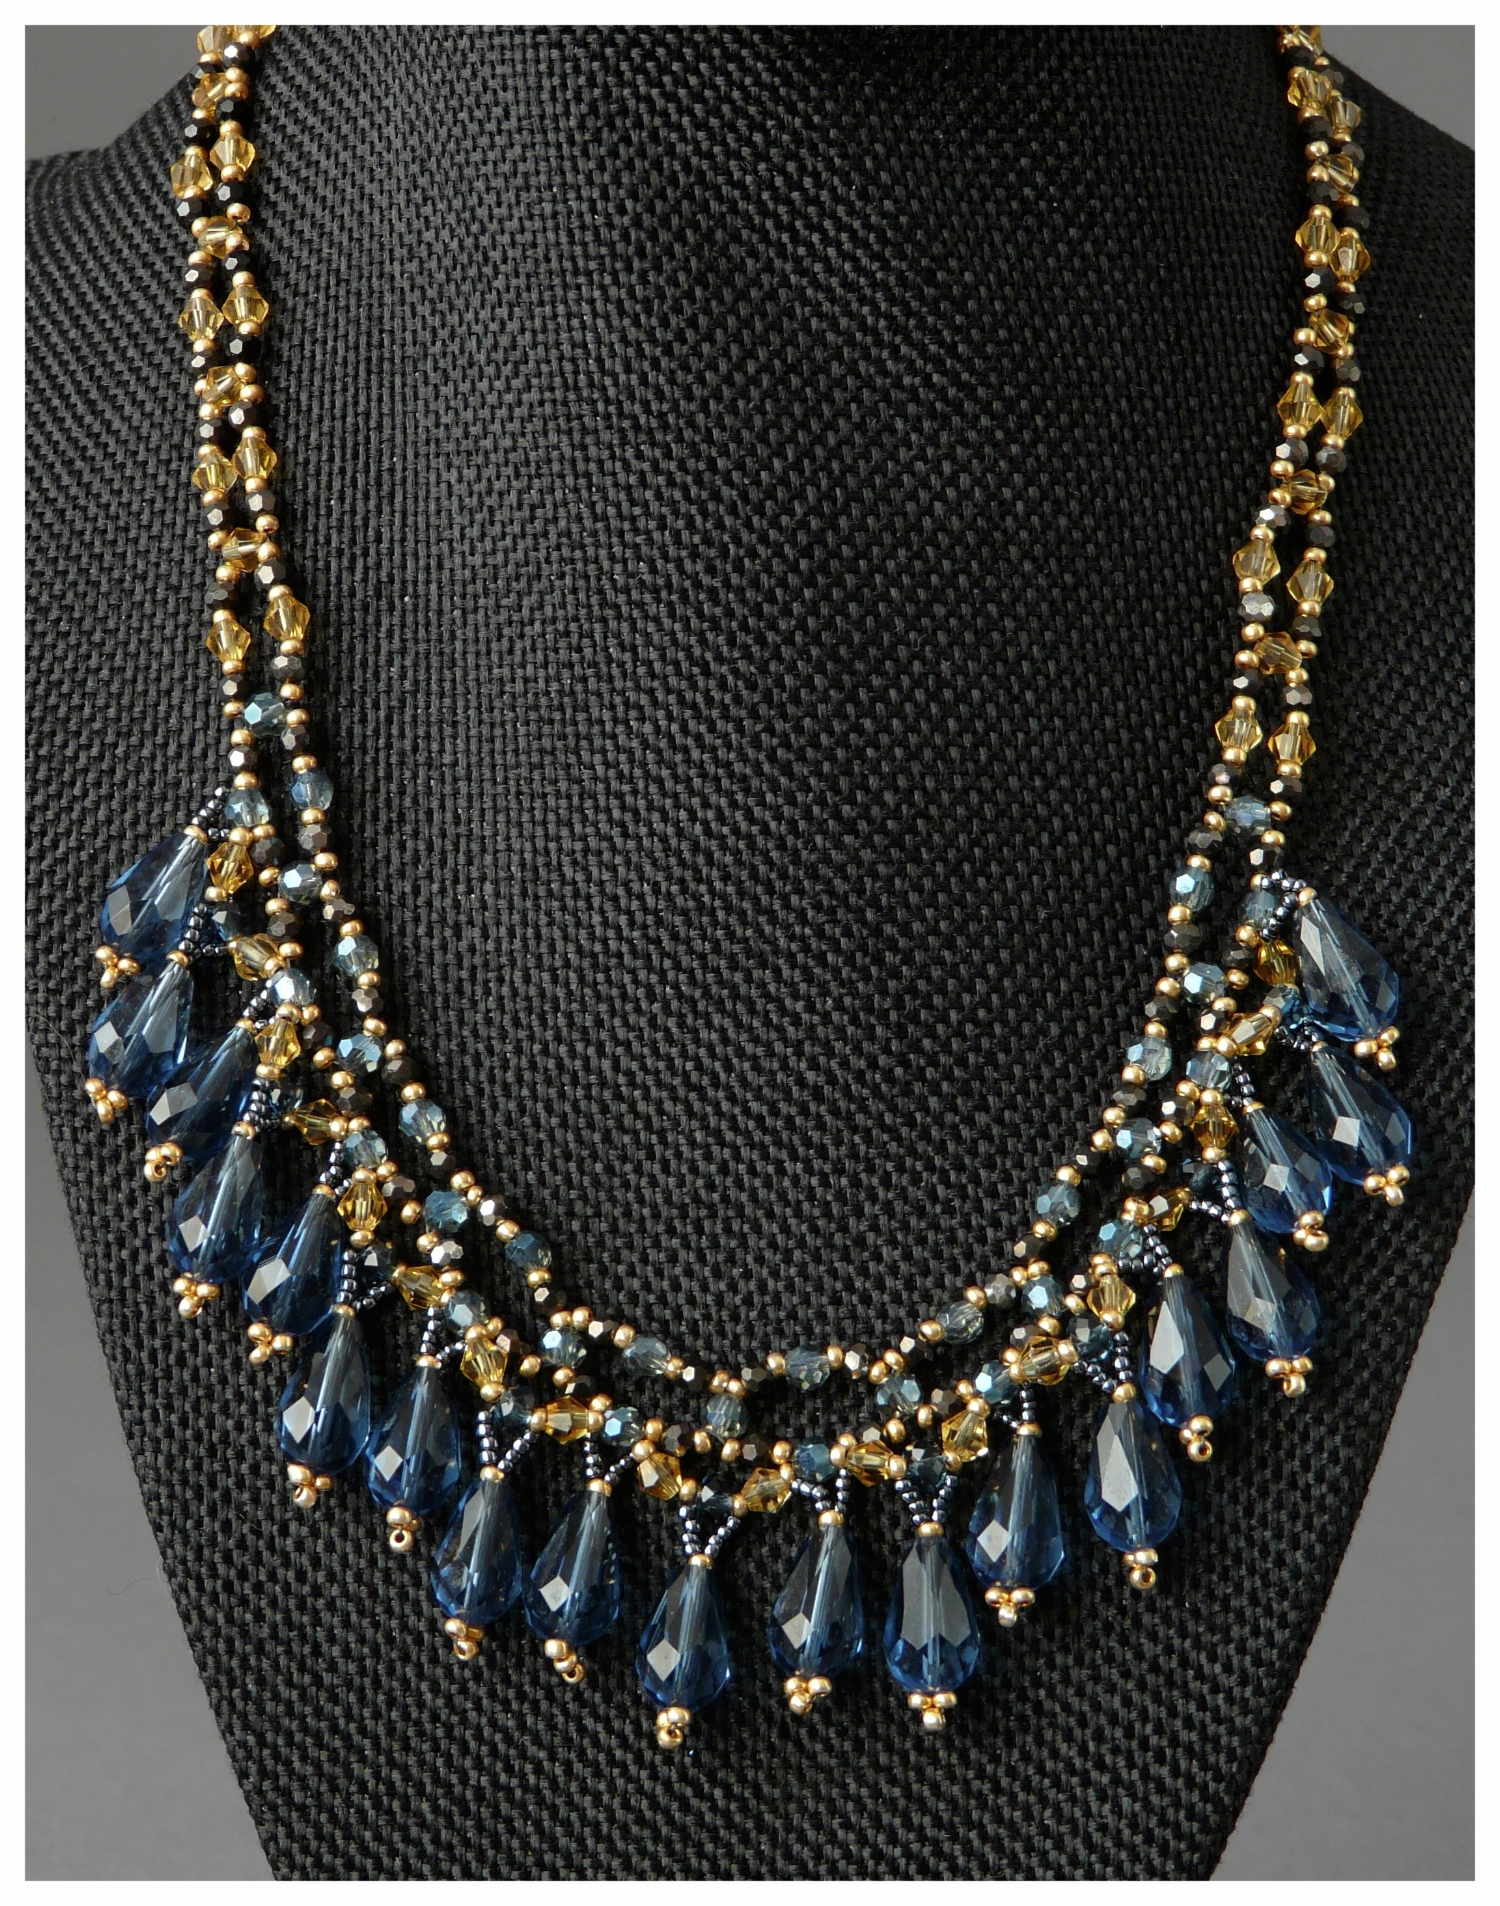 Vintage Drops Necklace